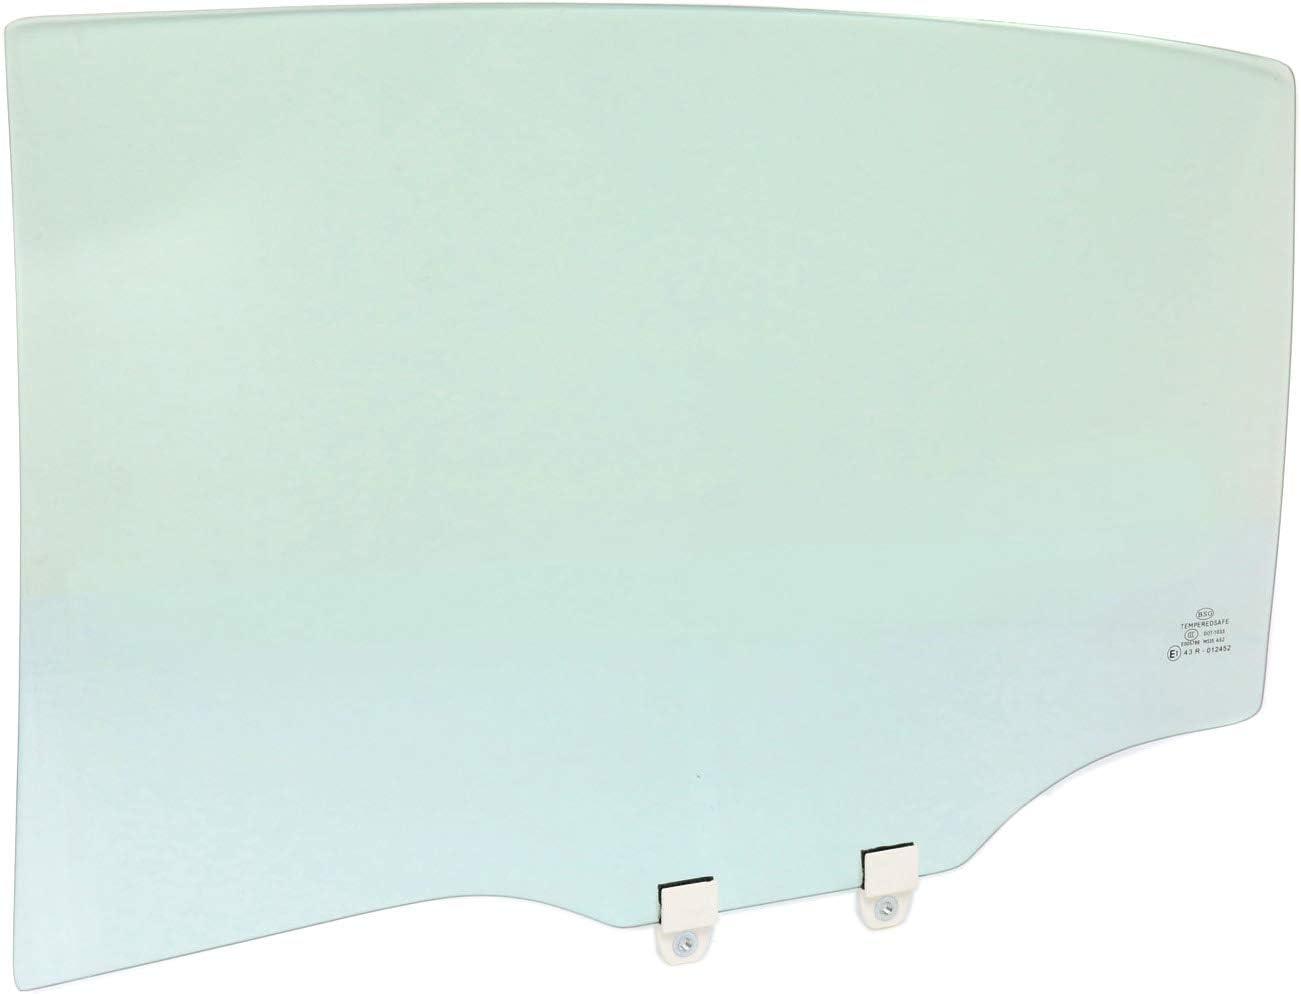 Evan-Fischer Rear Door Glass Compatible 2008-2012 Max 53% OFF with New mail order Acc Honda